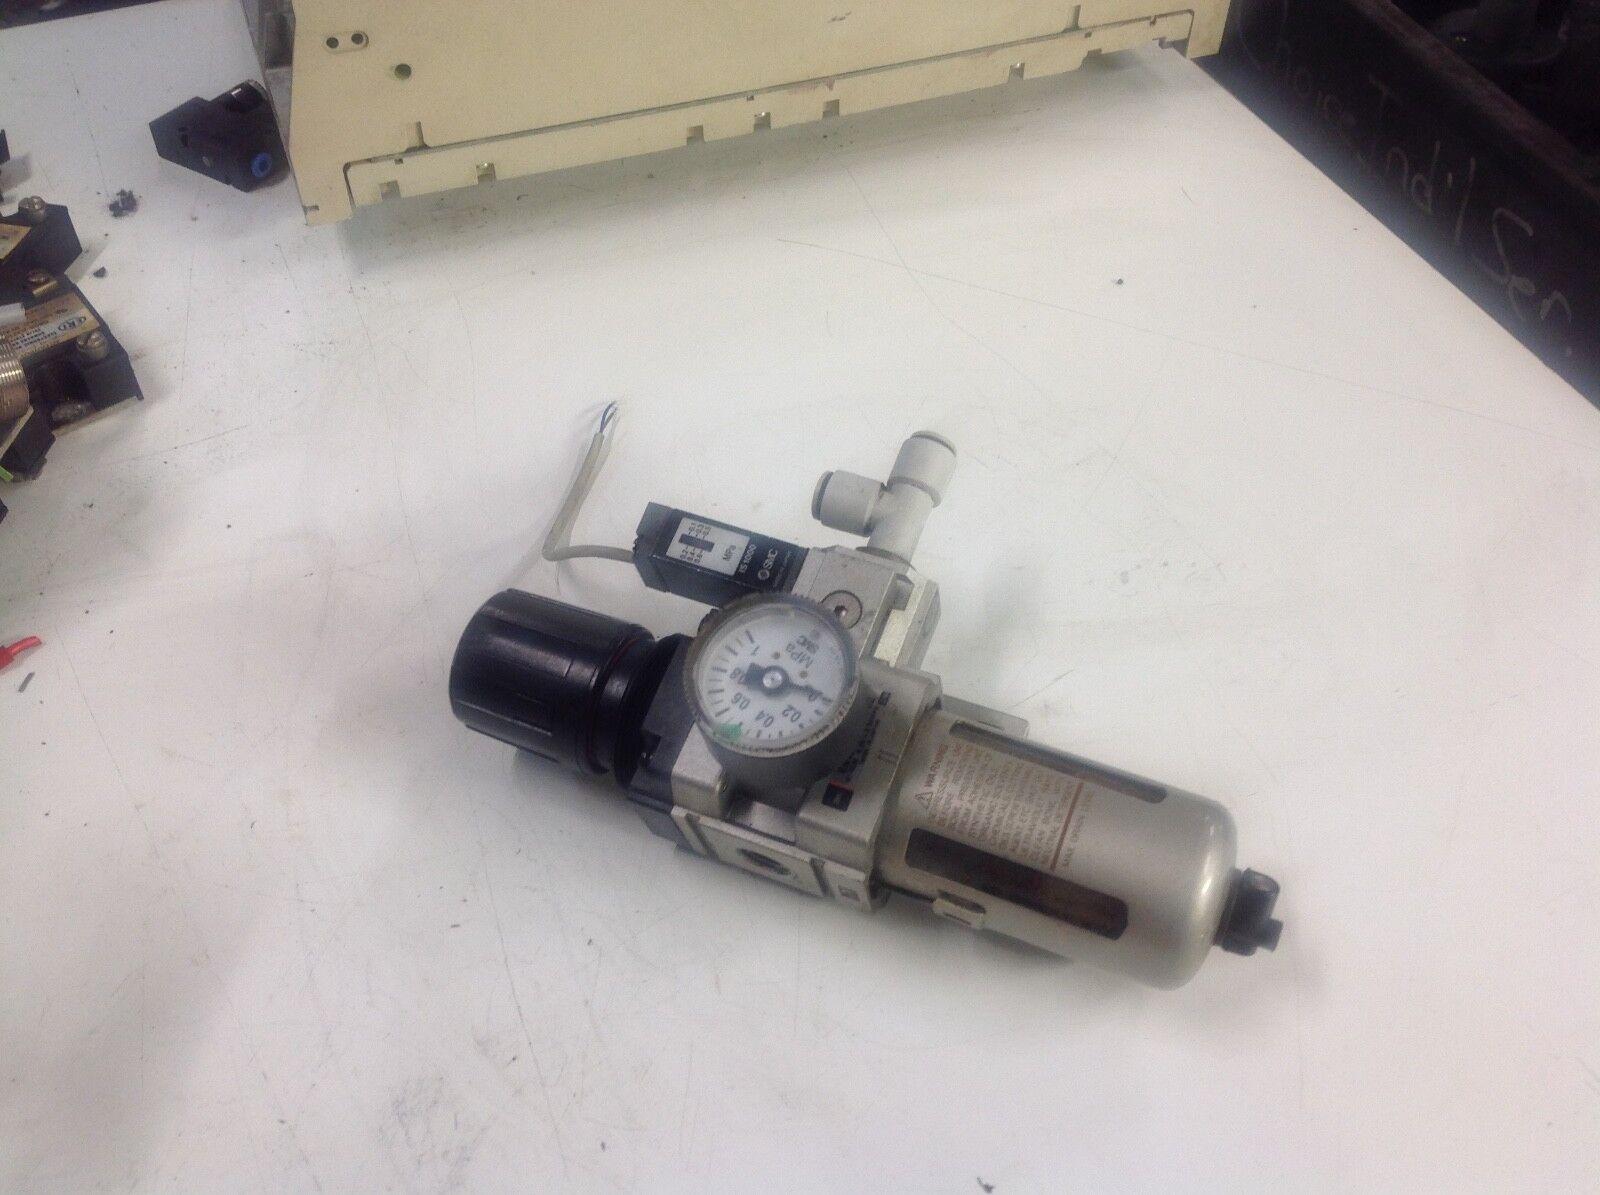 SMC Filter Regulator, EAW3000-F02, w/ Pressure Gage & IS1000 Pressure Switch